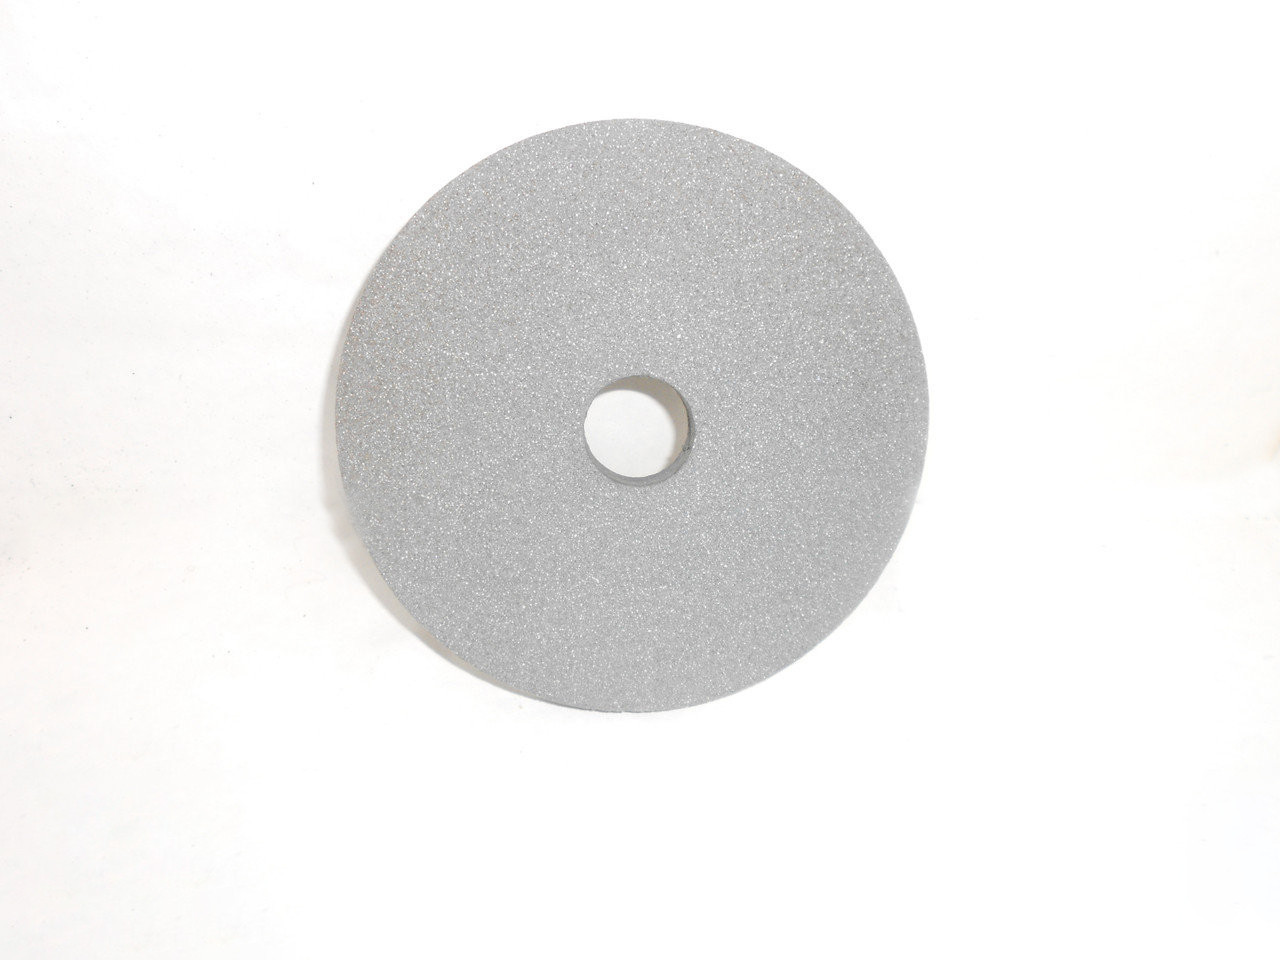 Круг шлифовальный 14А ПП 300х20х76  25 СМ2